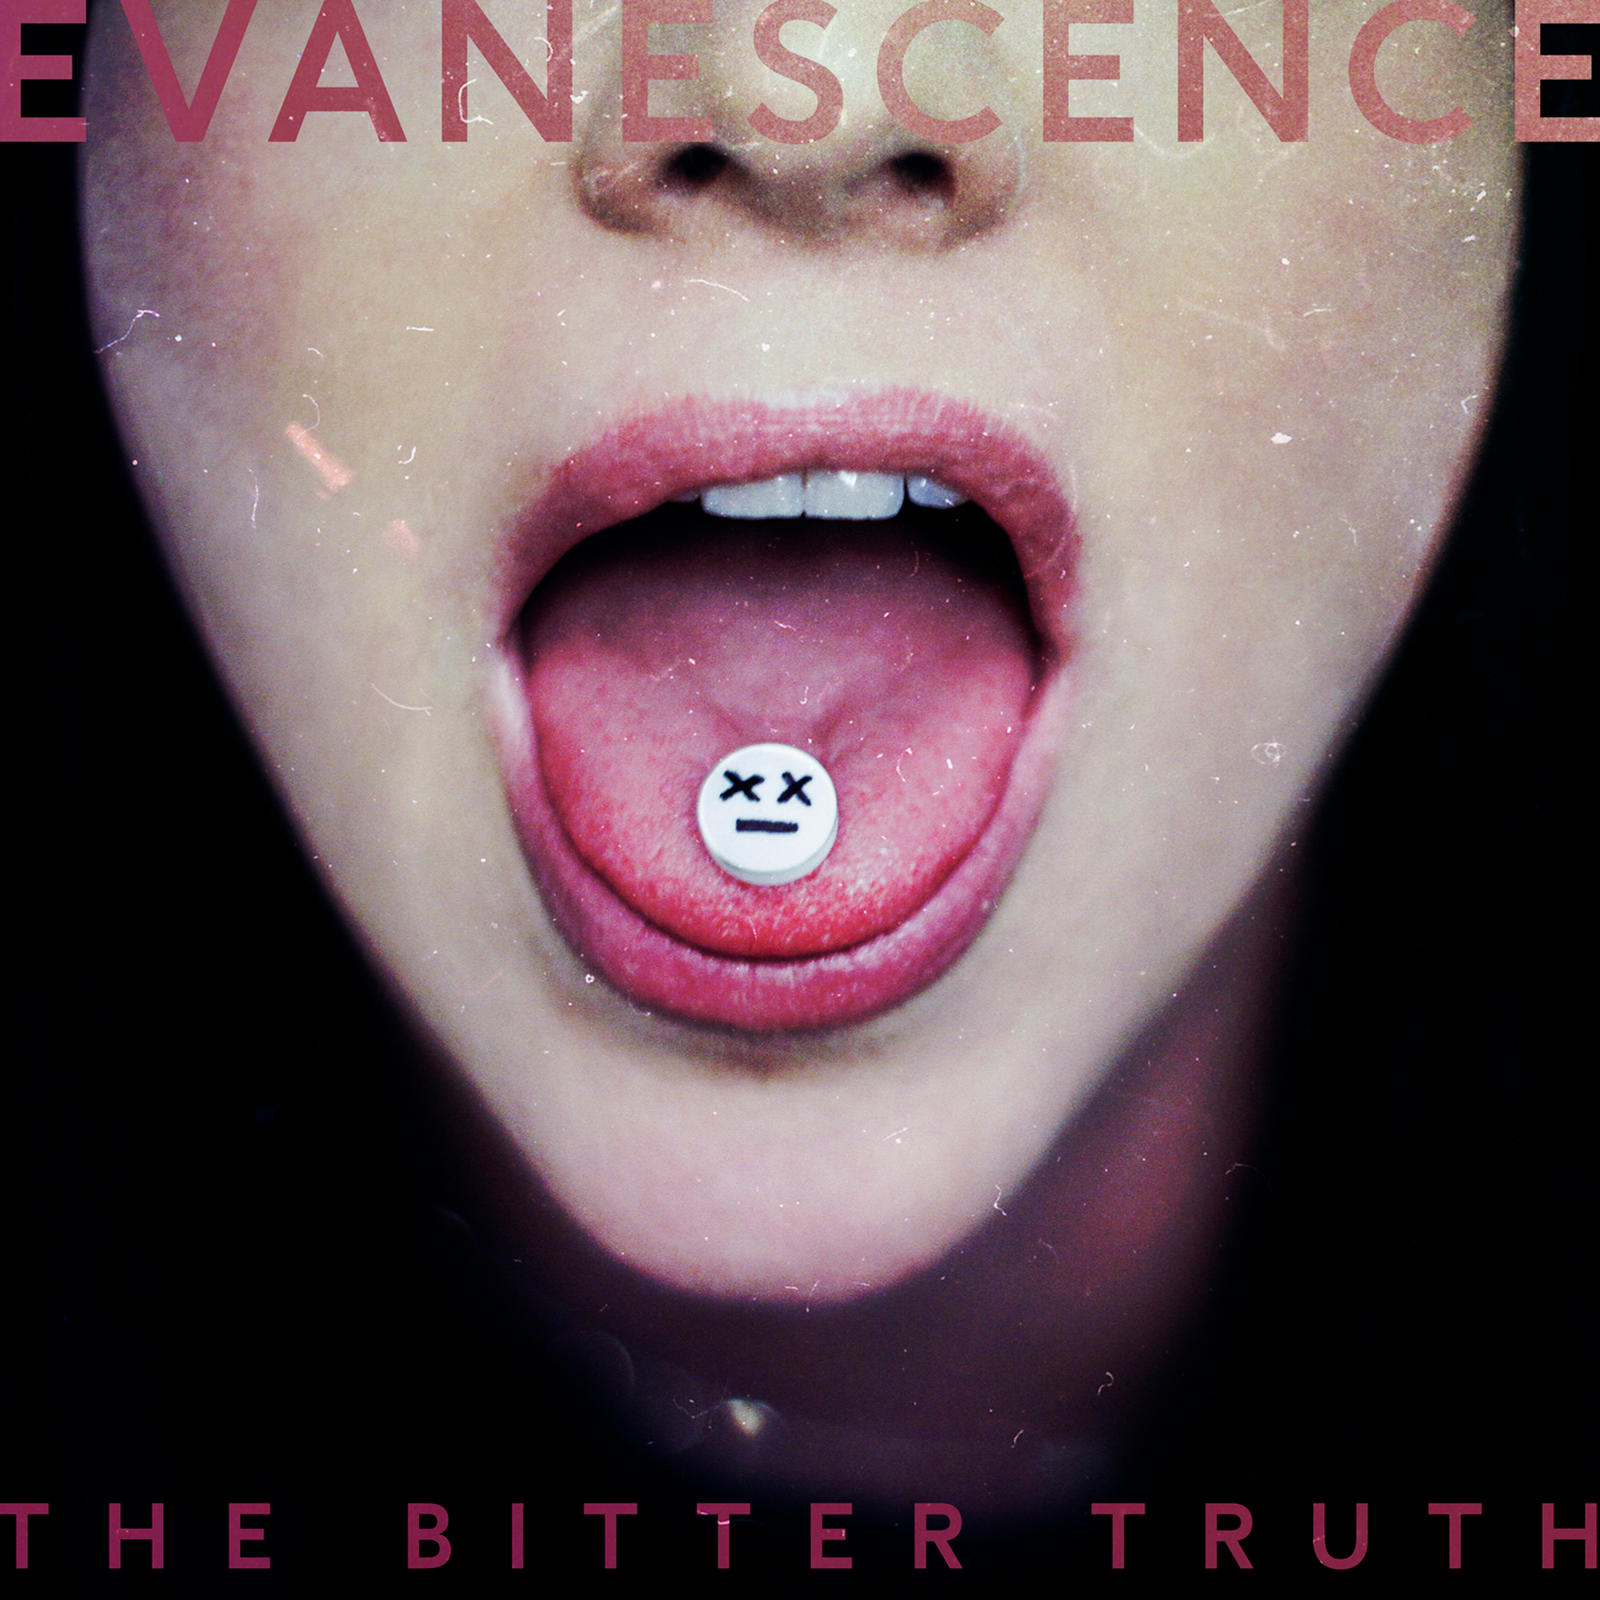 Nuovo singolo per gli Evanescence: on line Wasted On You 1